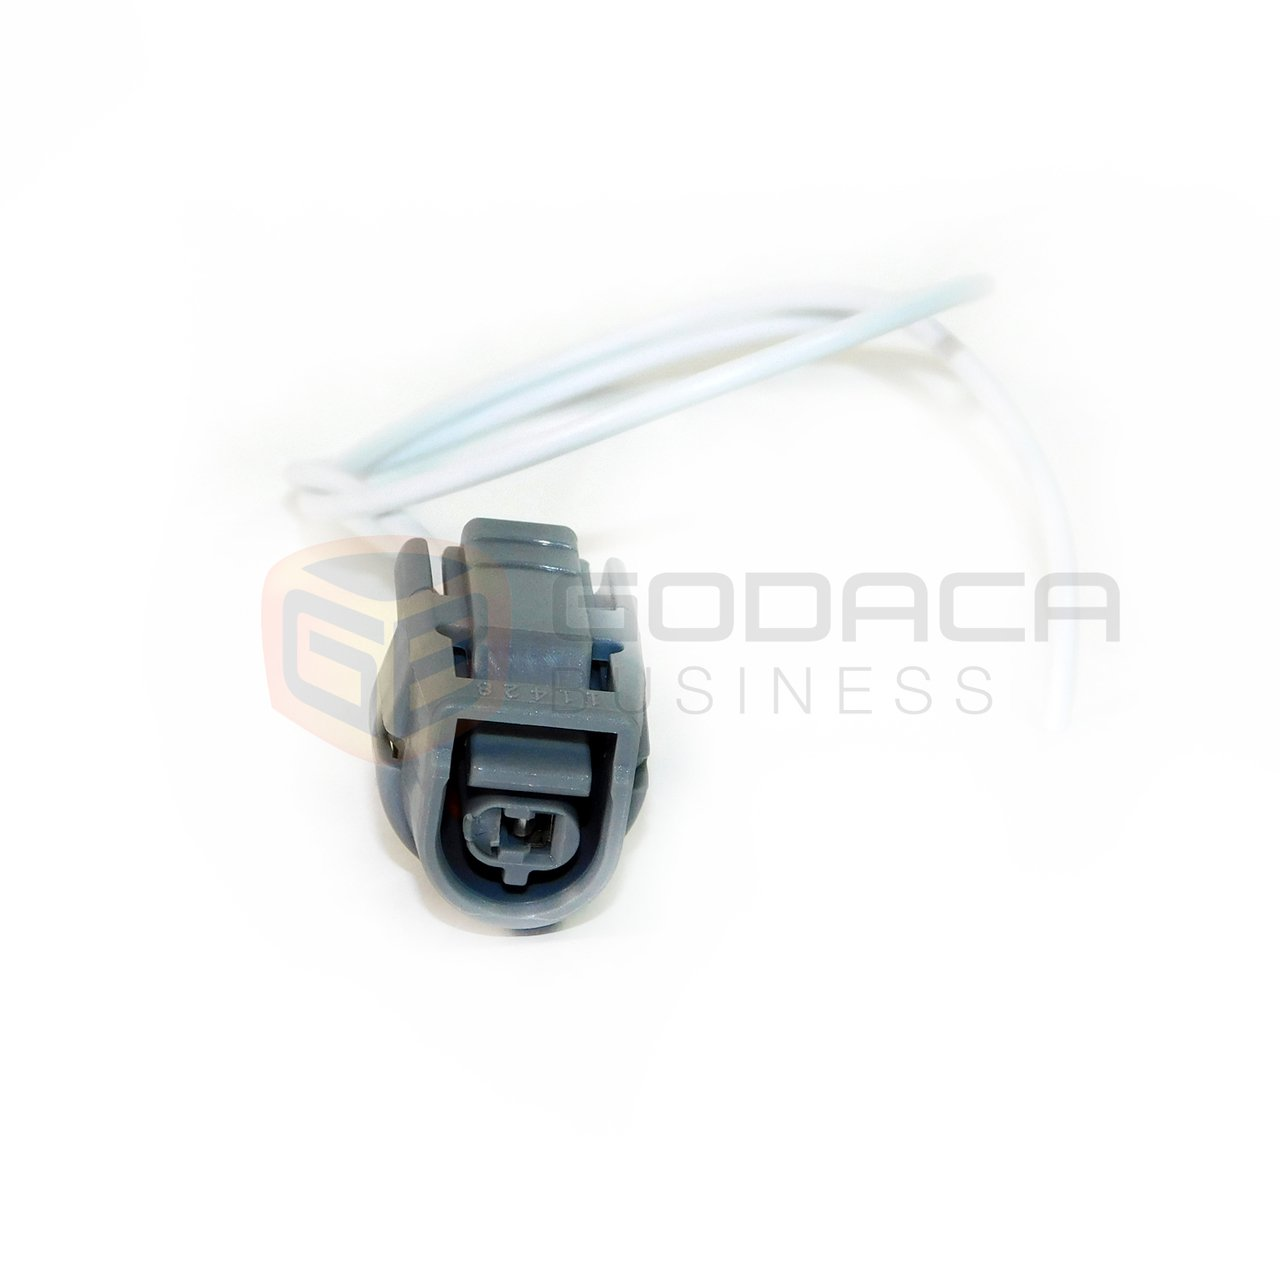 Amazon.com: 1x Connector Temperature sensor for Toyota 2JZ 90980-11428 with  wire: Automotive